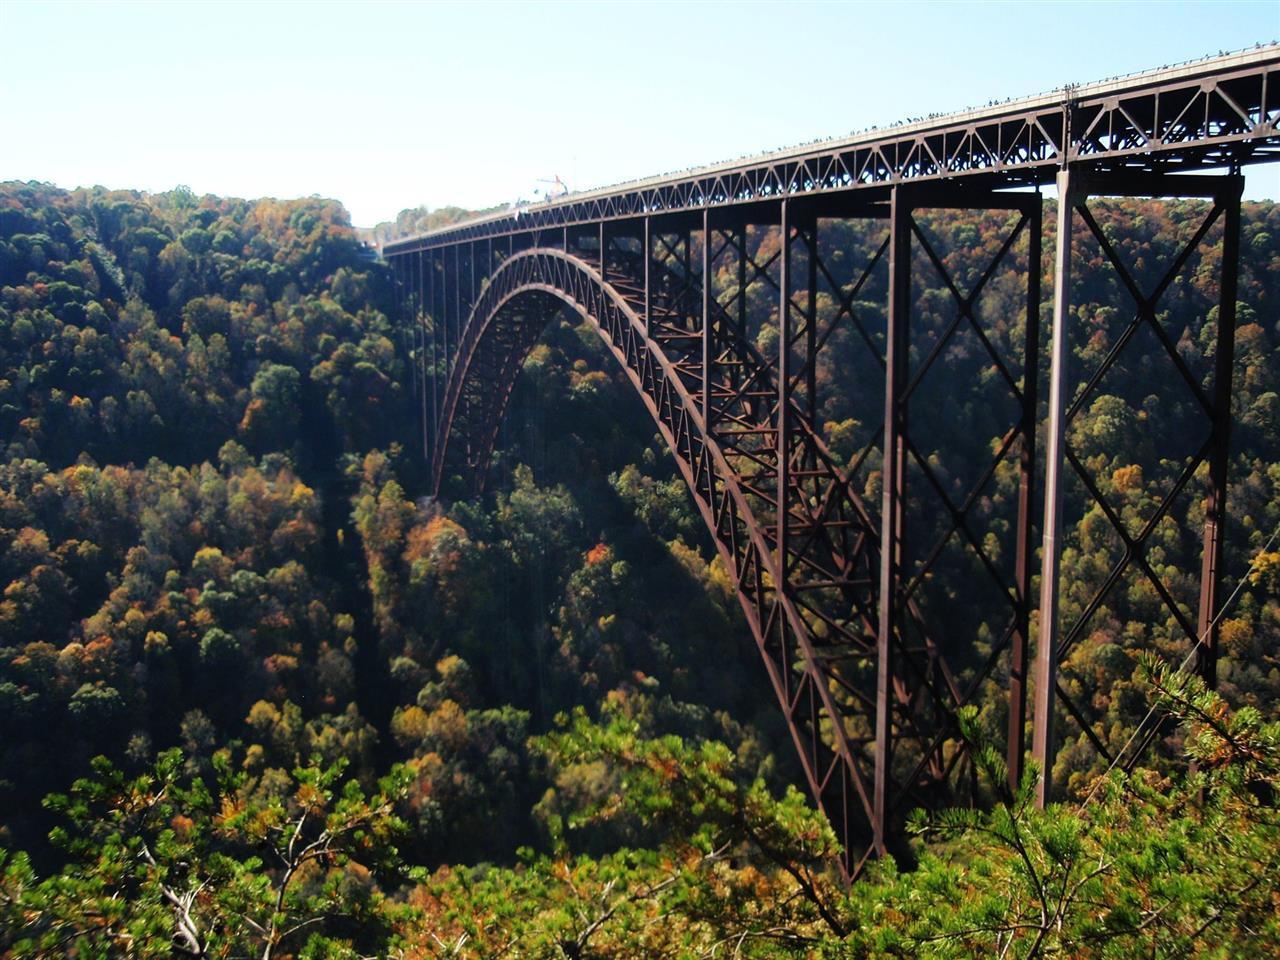 New River Gorge Bridge Fayetteville, West Virginia